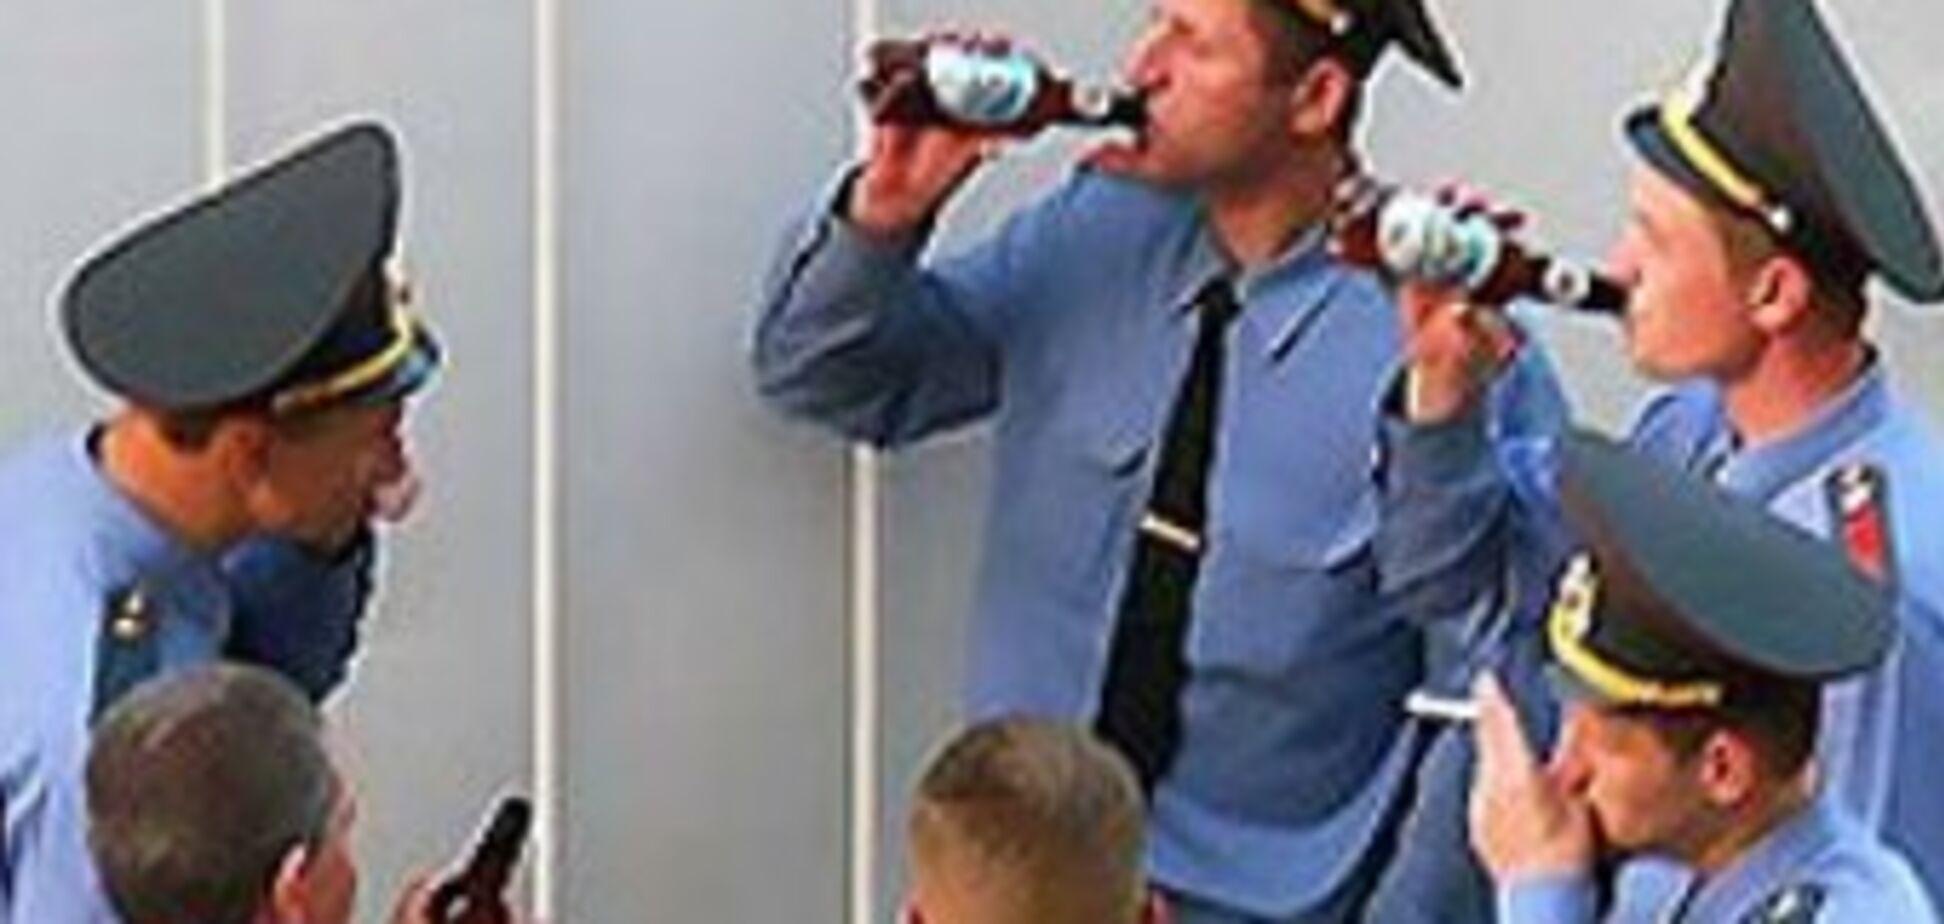 Генерал милиции написал книгу 'Как надо «бухать» на работе'